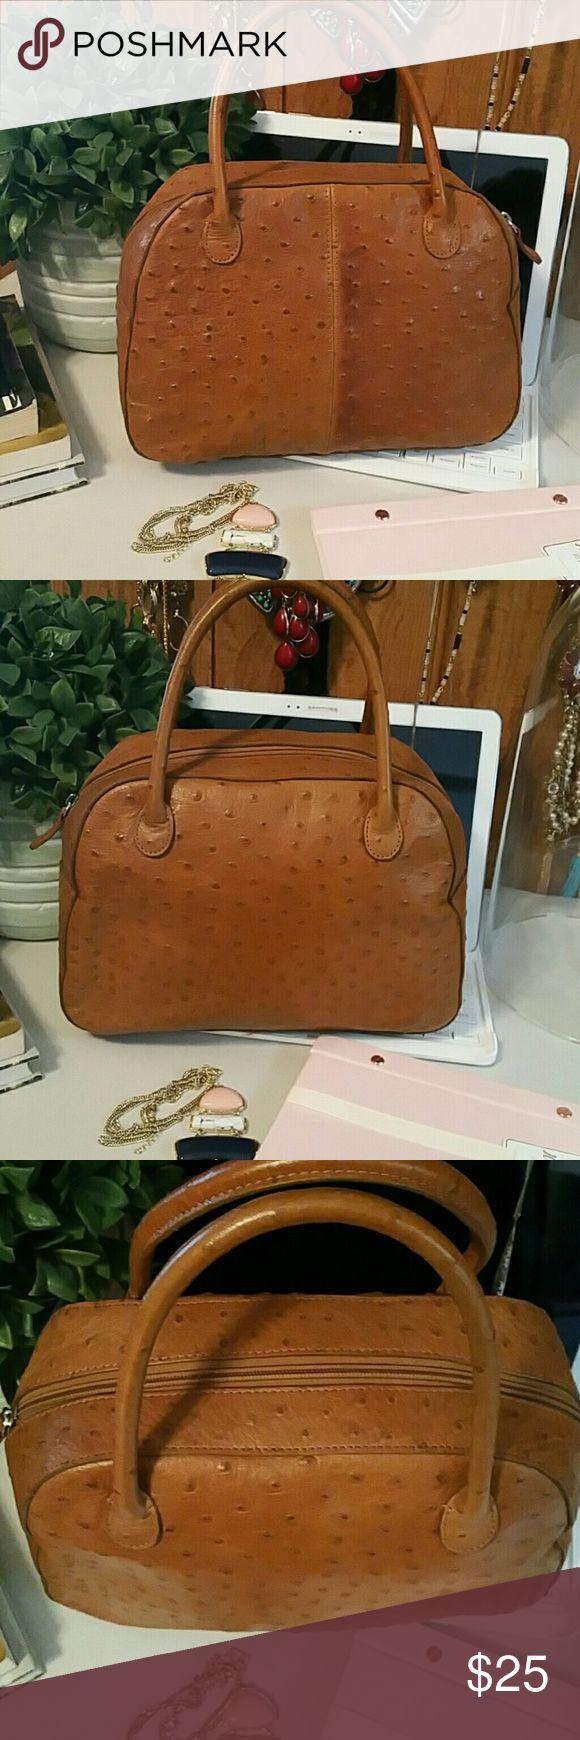 Wilson pelle studio leather bag Wilsons leather bag